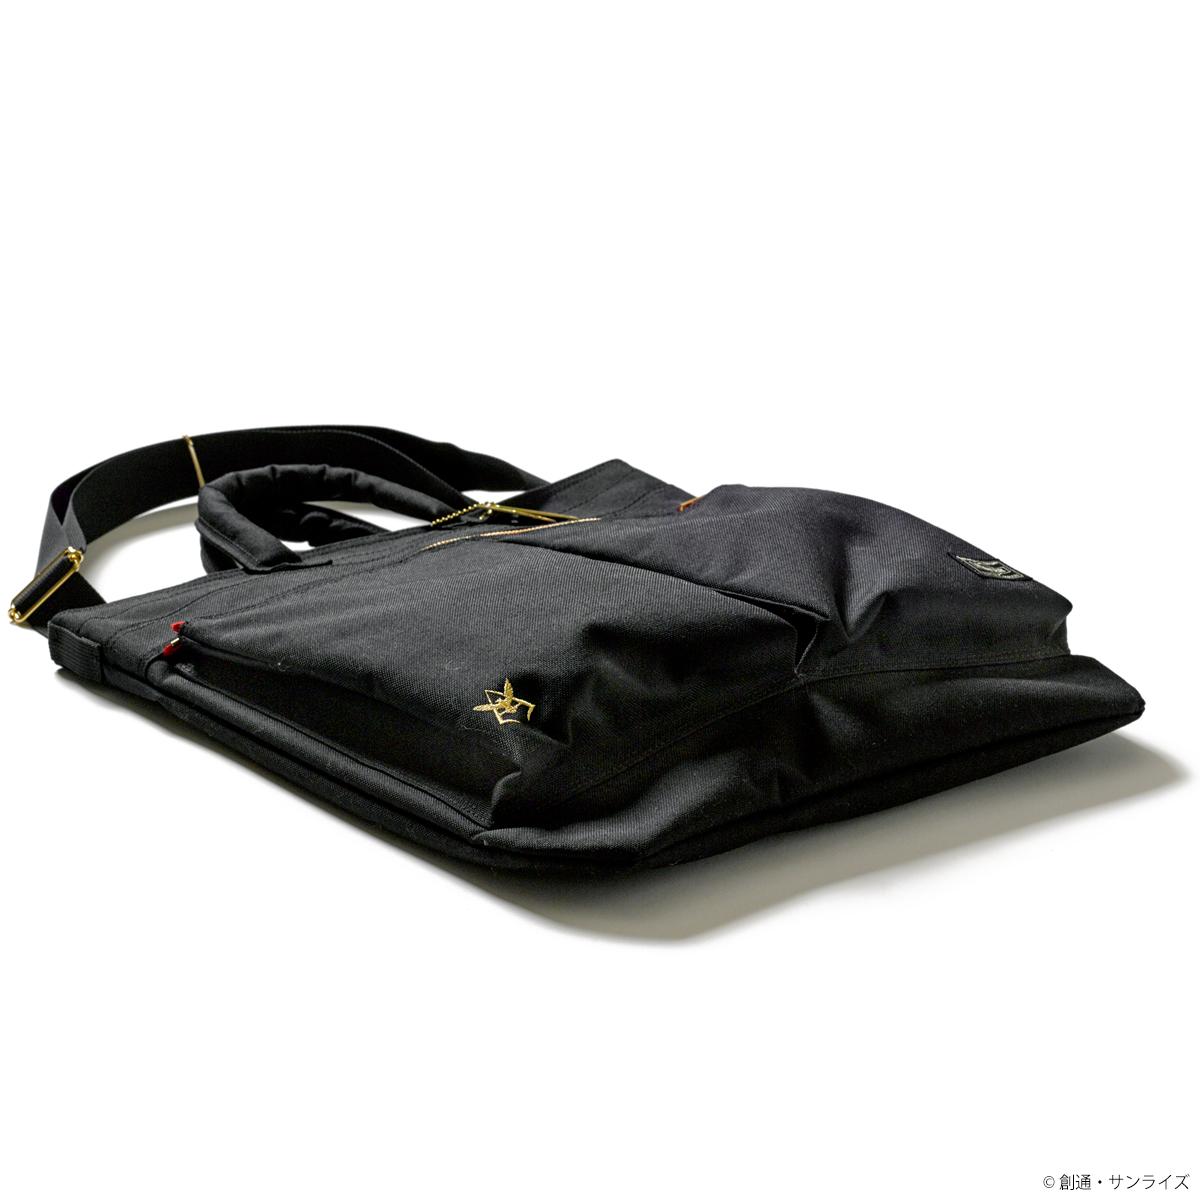 STRICT-G × PORTER 2WAYヘルメットバッグ シャアモデル